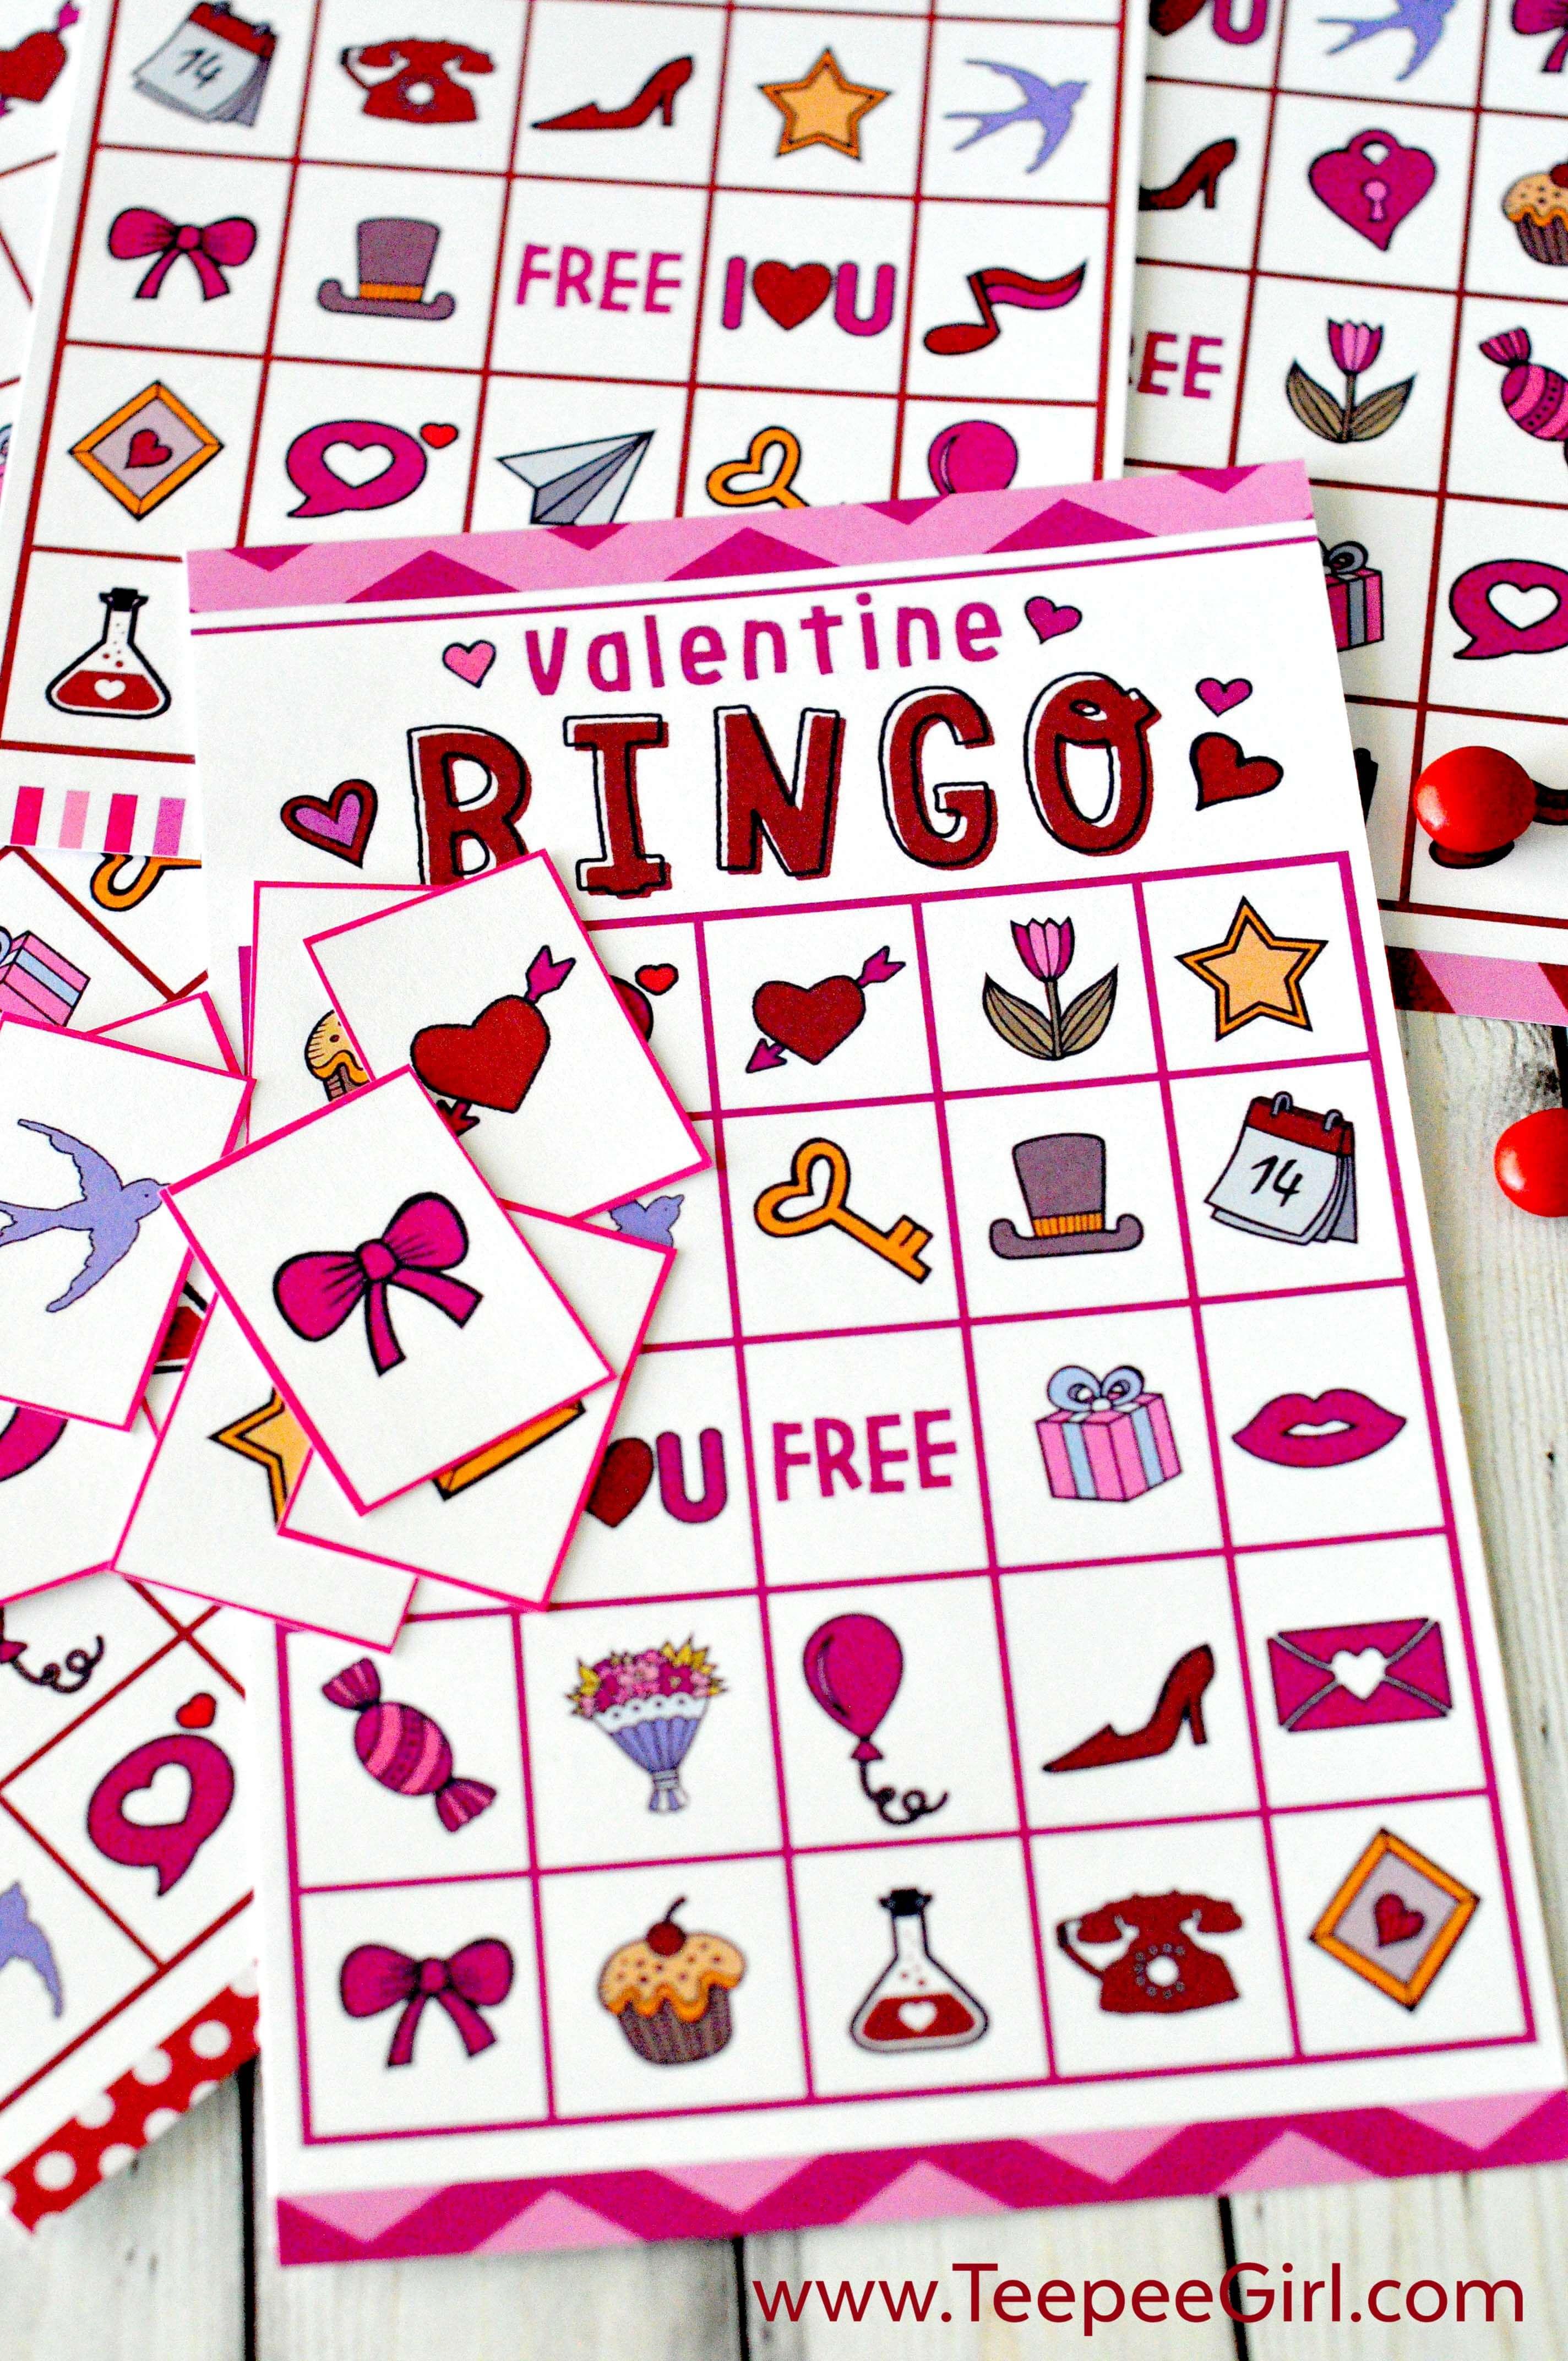 Free Valentines Day Printable Bingo Game – Free Valentine Bingo Cards